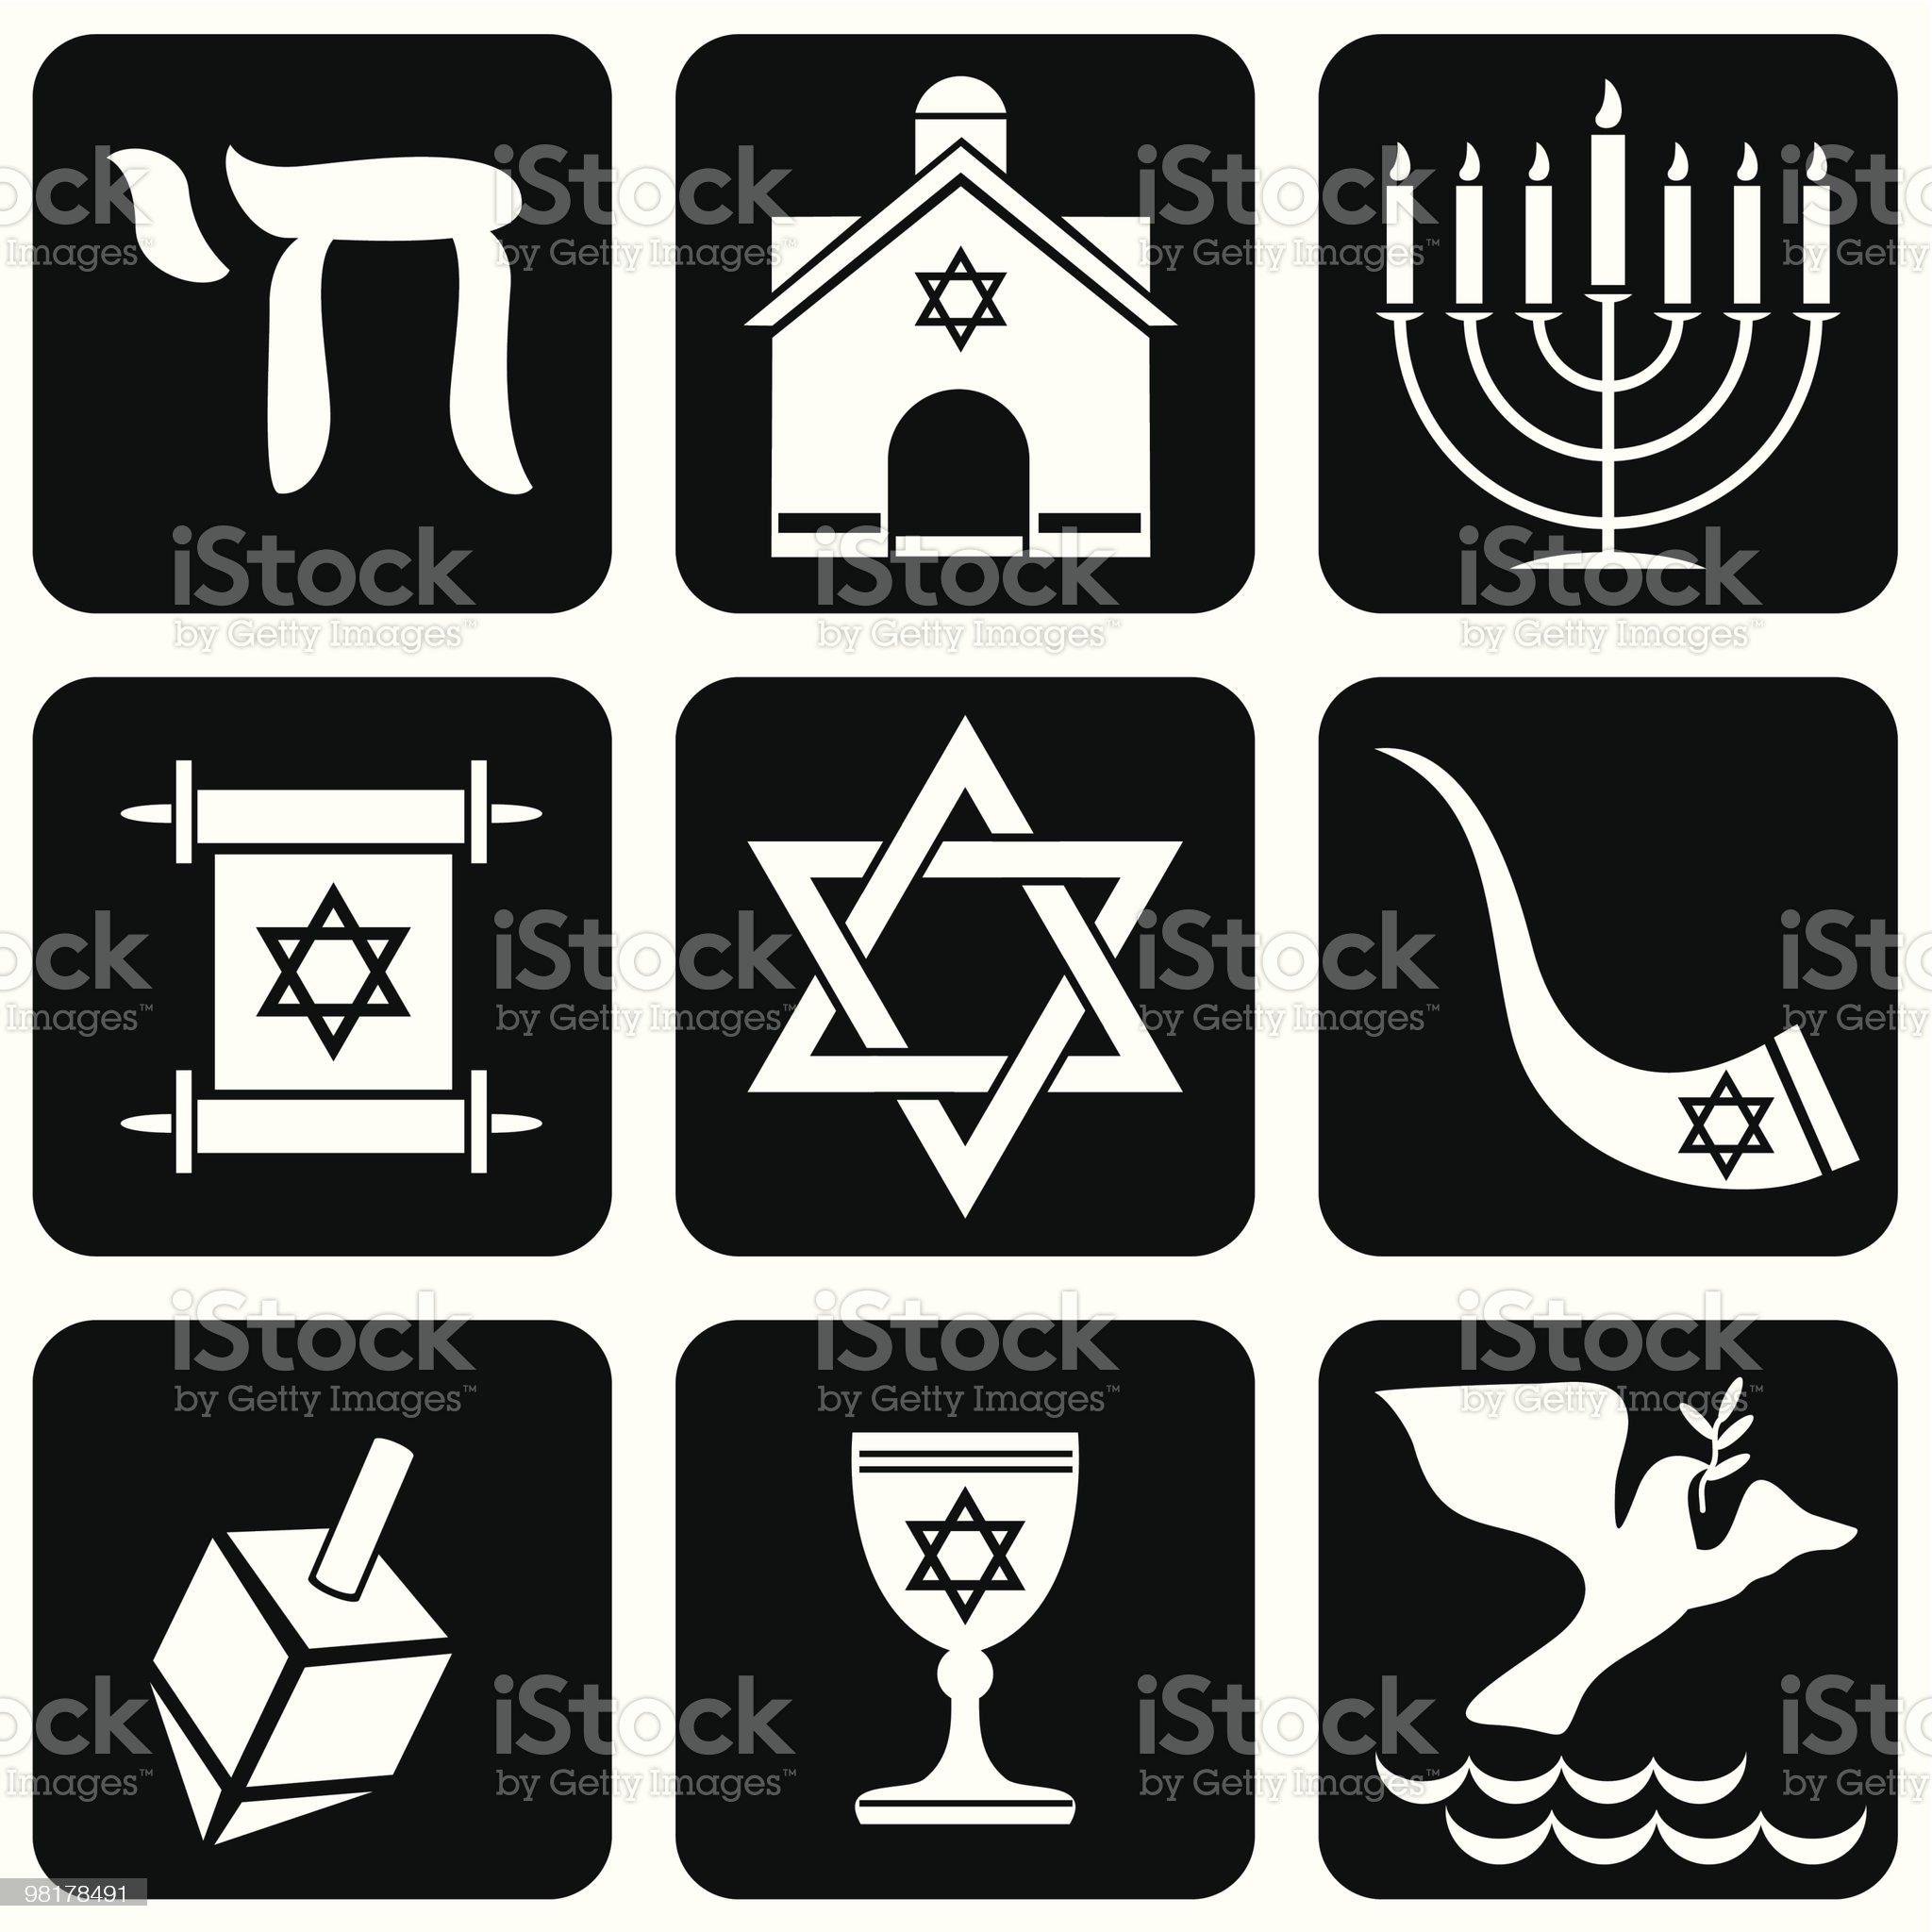 judaism symbols royalty-free stock vector art